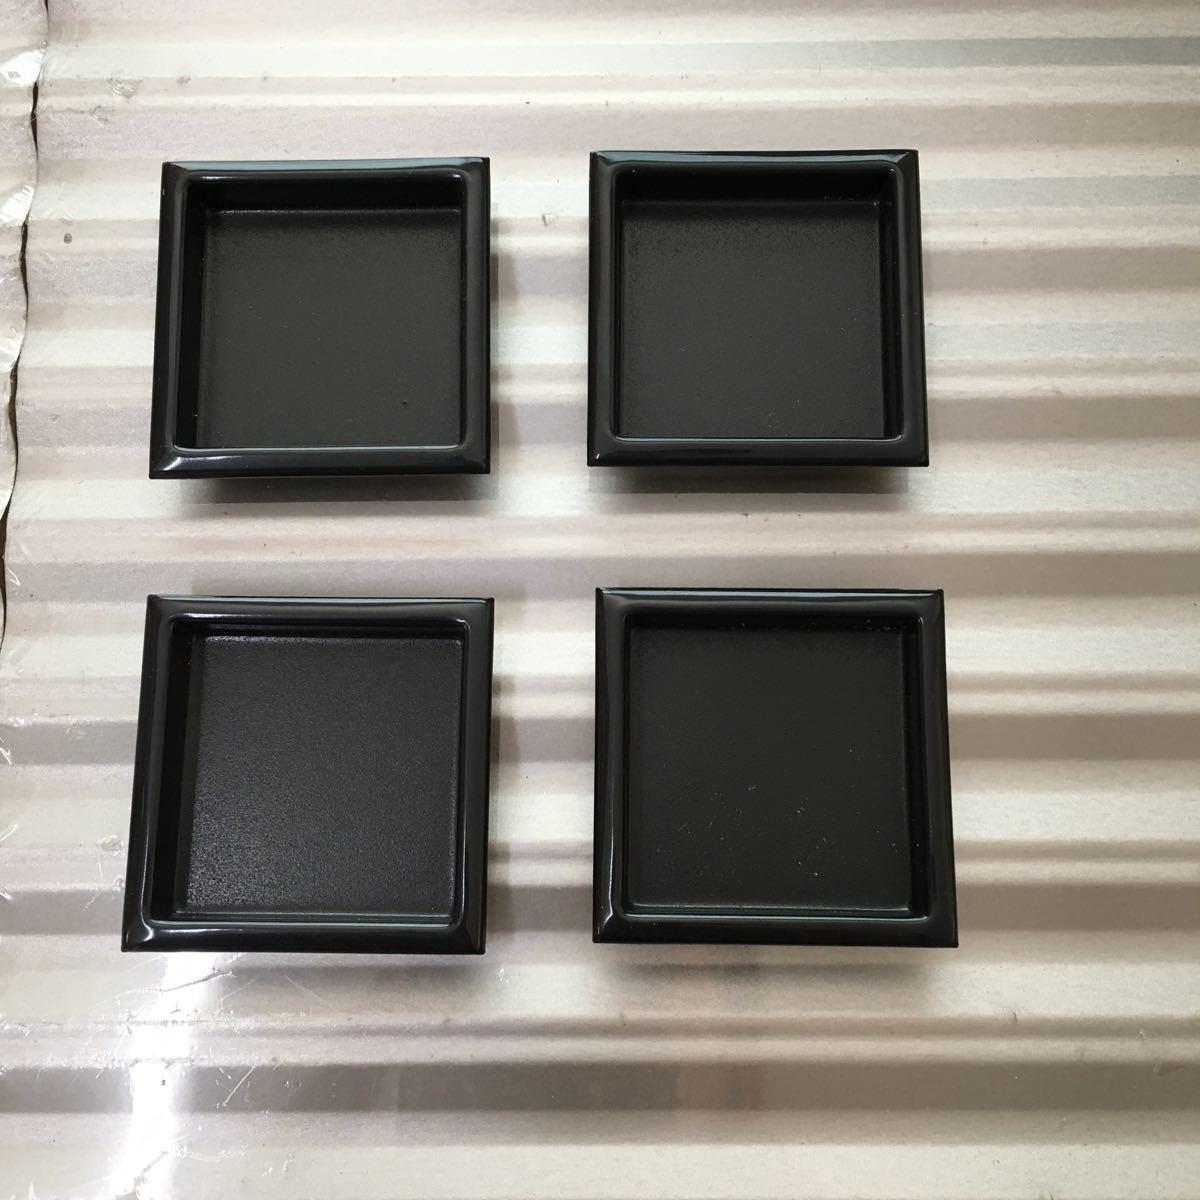 襖 引き手 真鍮 四方角 4個セット 44㍉×44㍉ 定形外郵便発送可